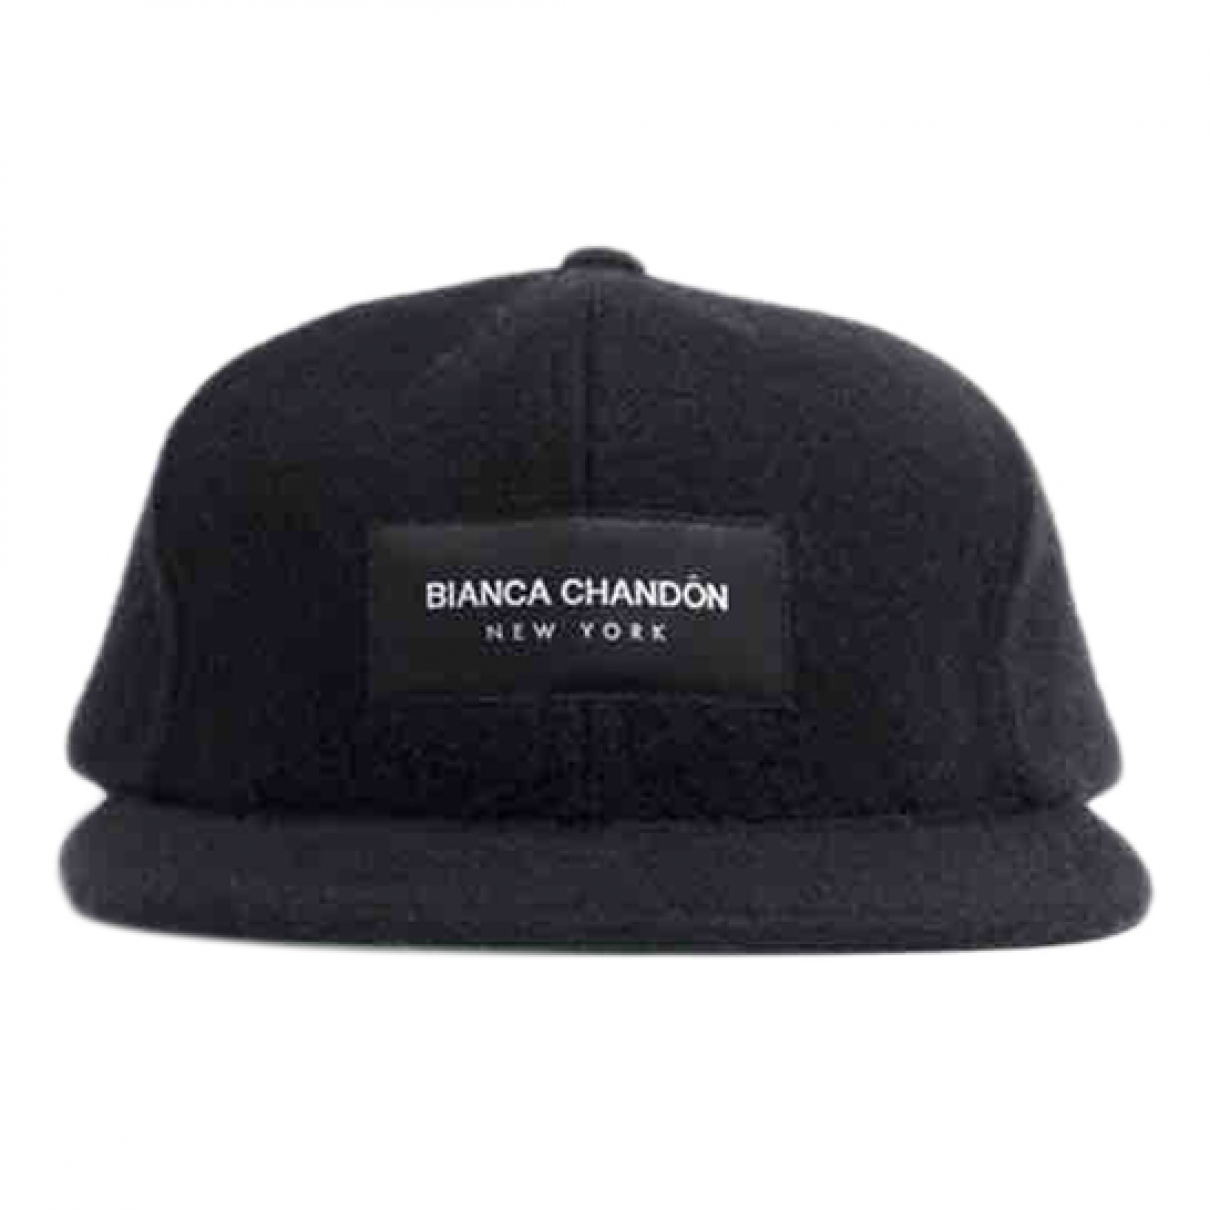 Bianca Chandon \N Black Wool hat & pull on hat for Men M International